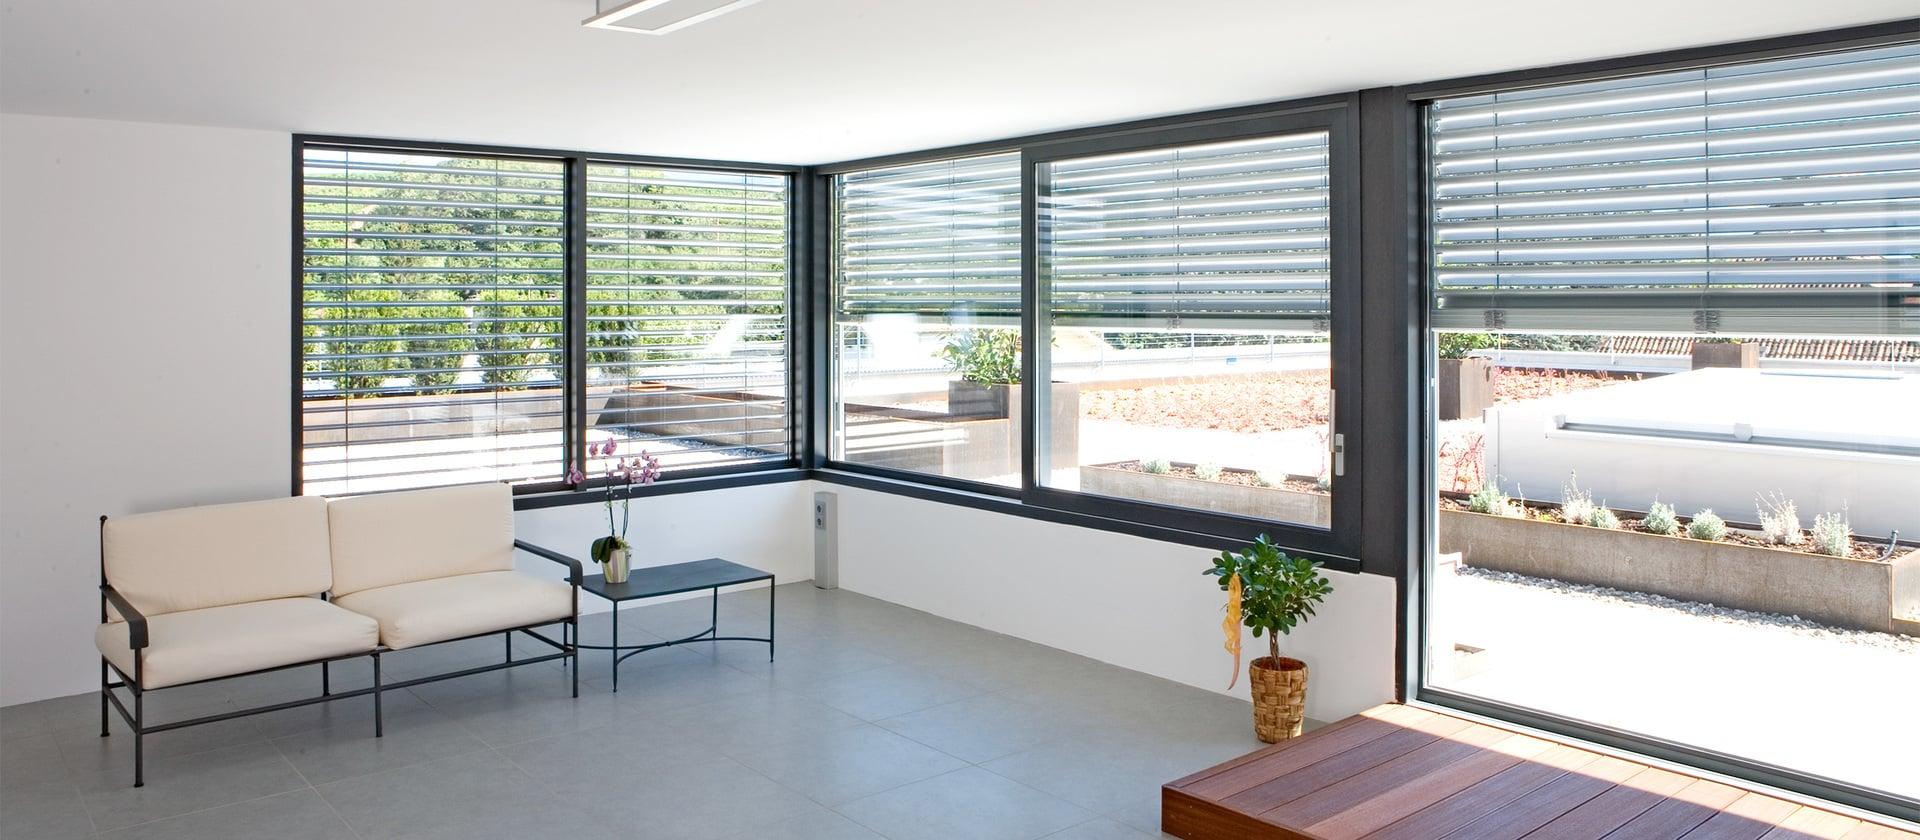 Windows and doors made of aluminium